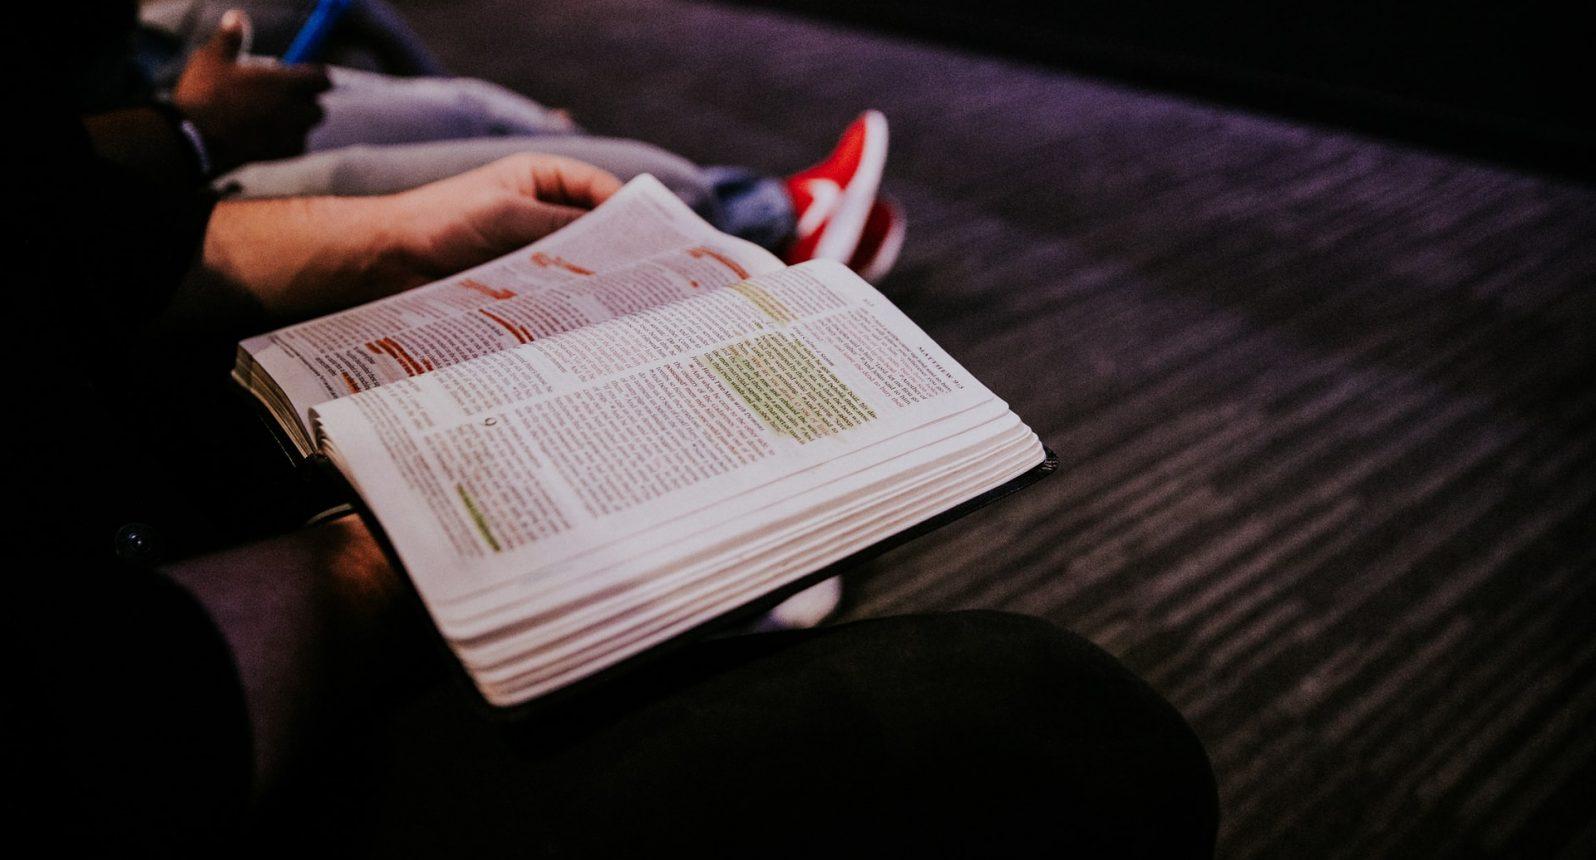 Pessoa segurando bíblia. Foto de Hannah Busing no Unsplash